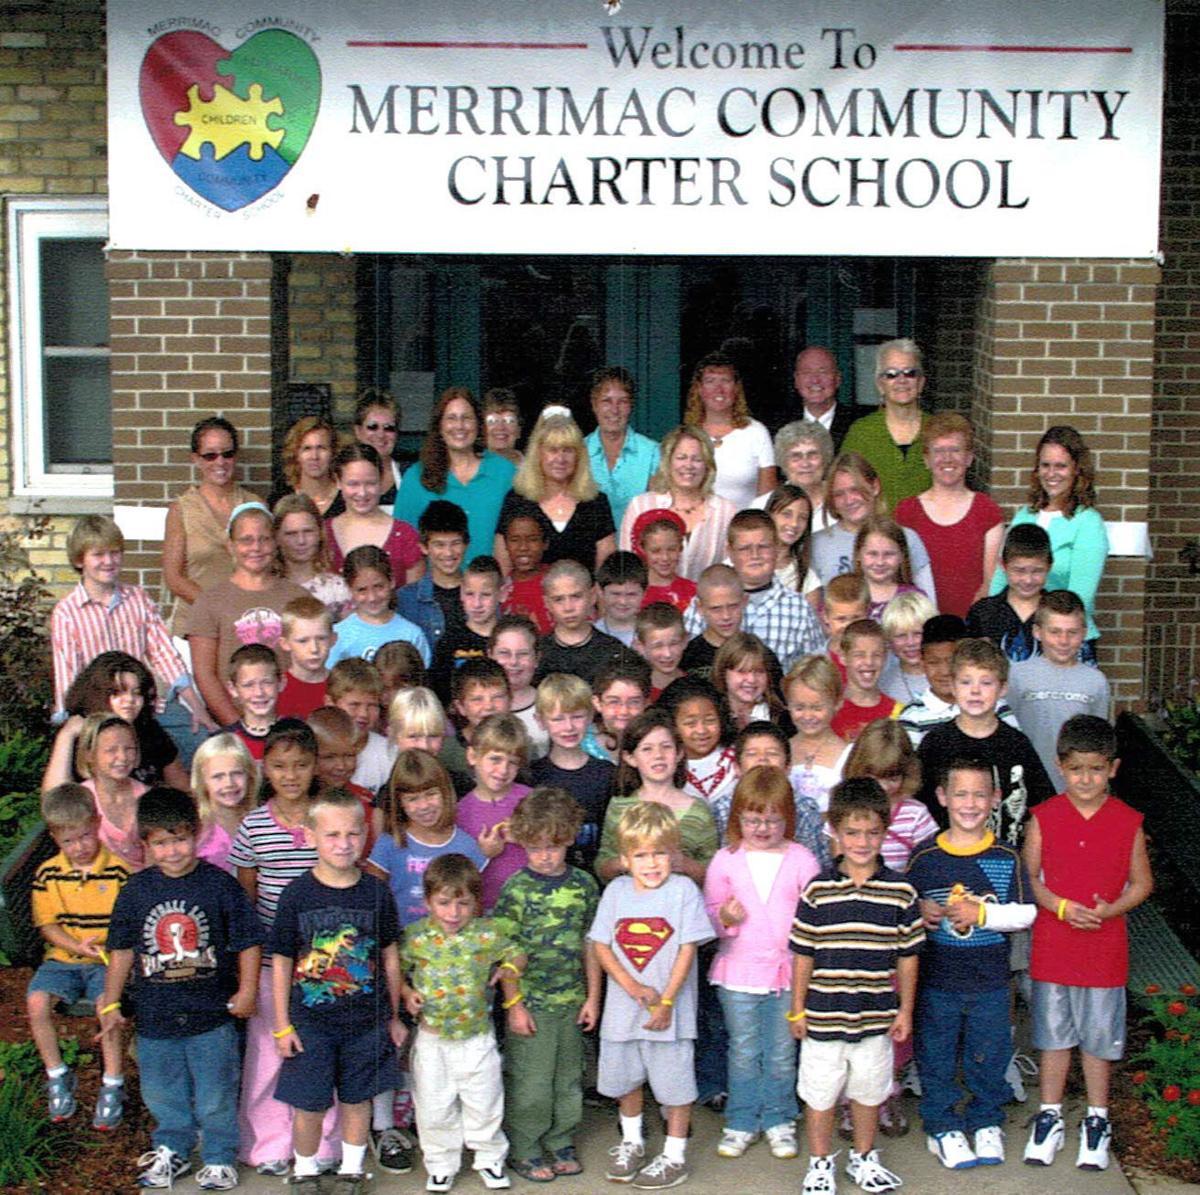 Merrimac Community Charter School (copy)